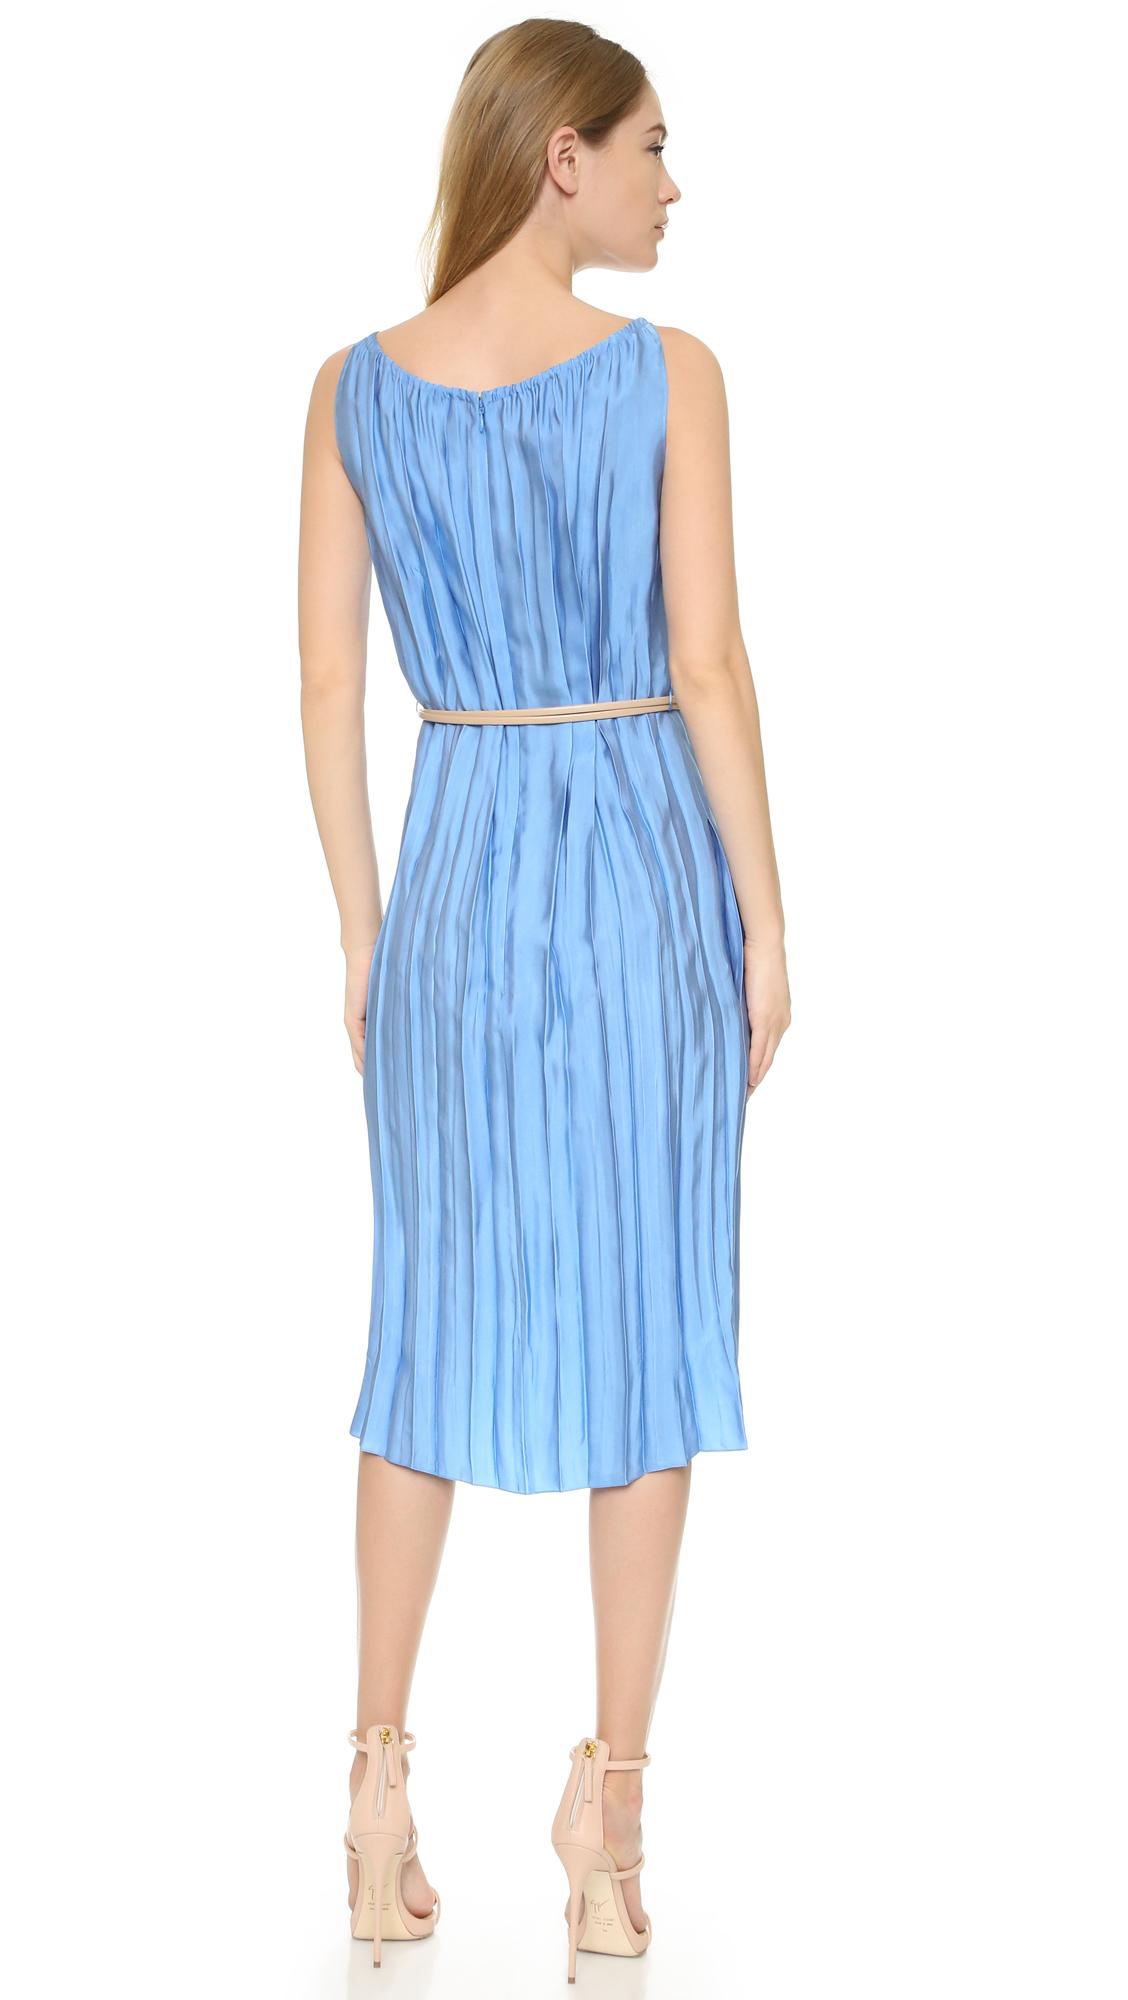 Nina ricci Pleated Dress in Blue | Lyst